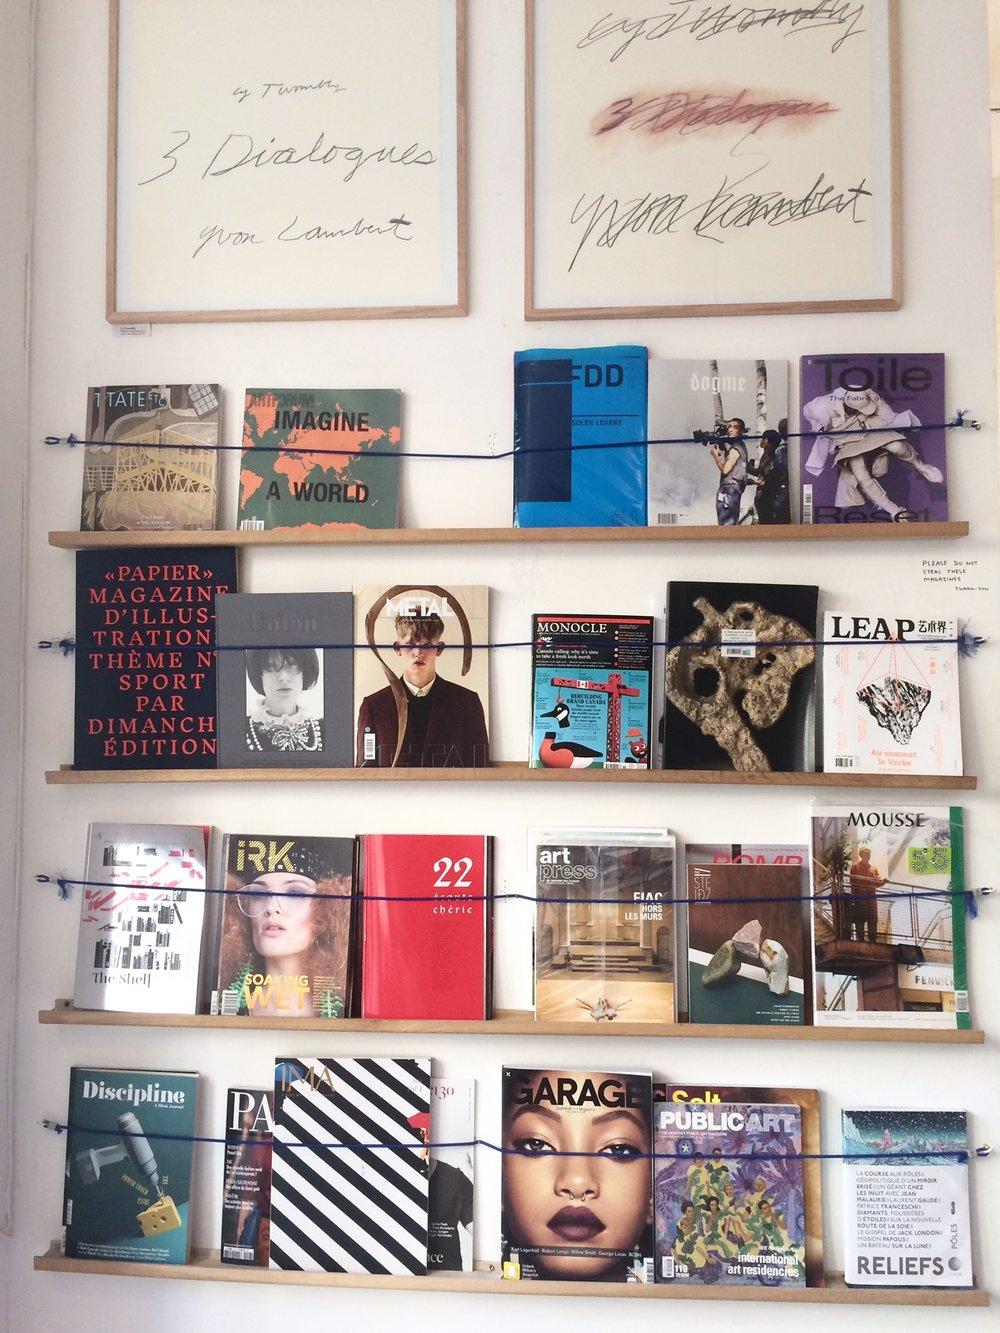 Papier Magazine at Librairie Yvon Lambert in Paris